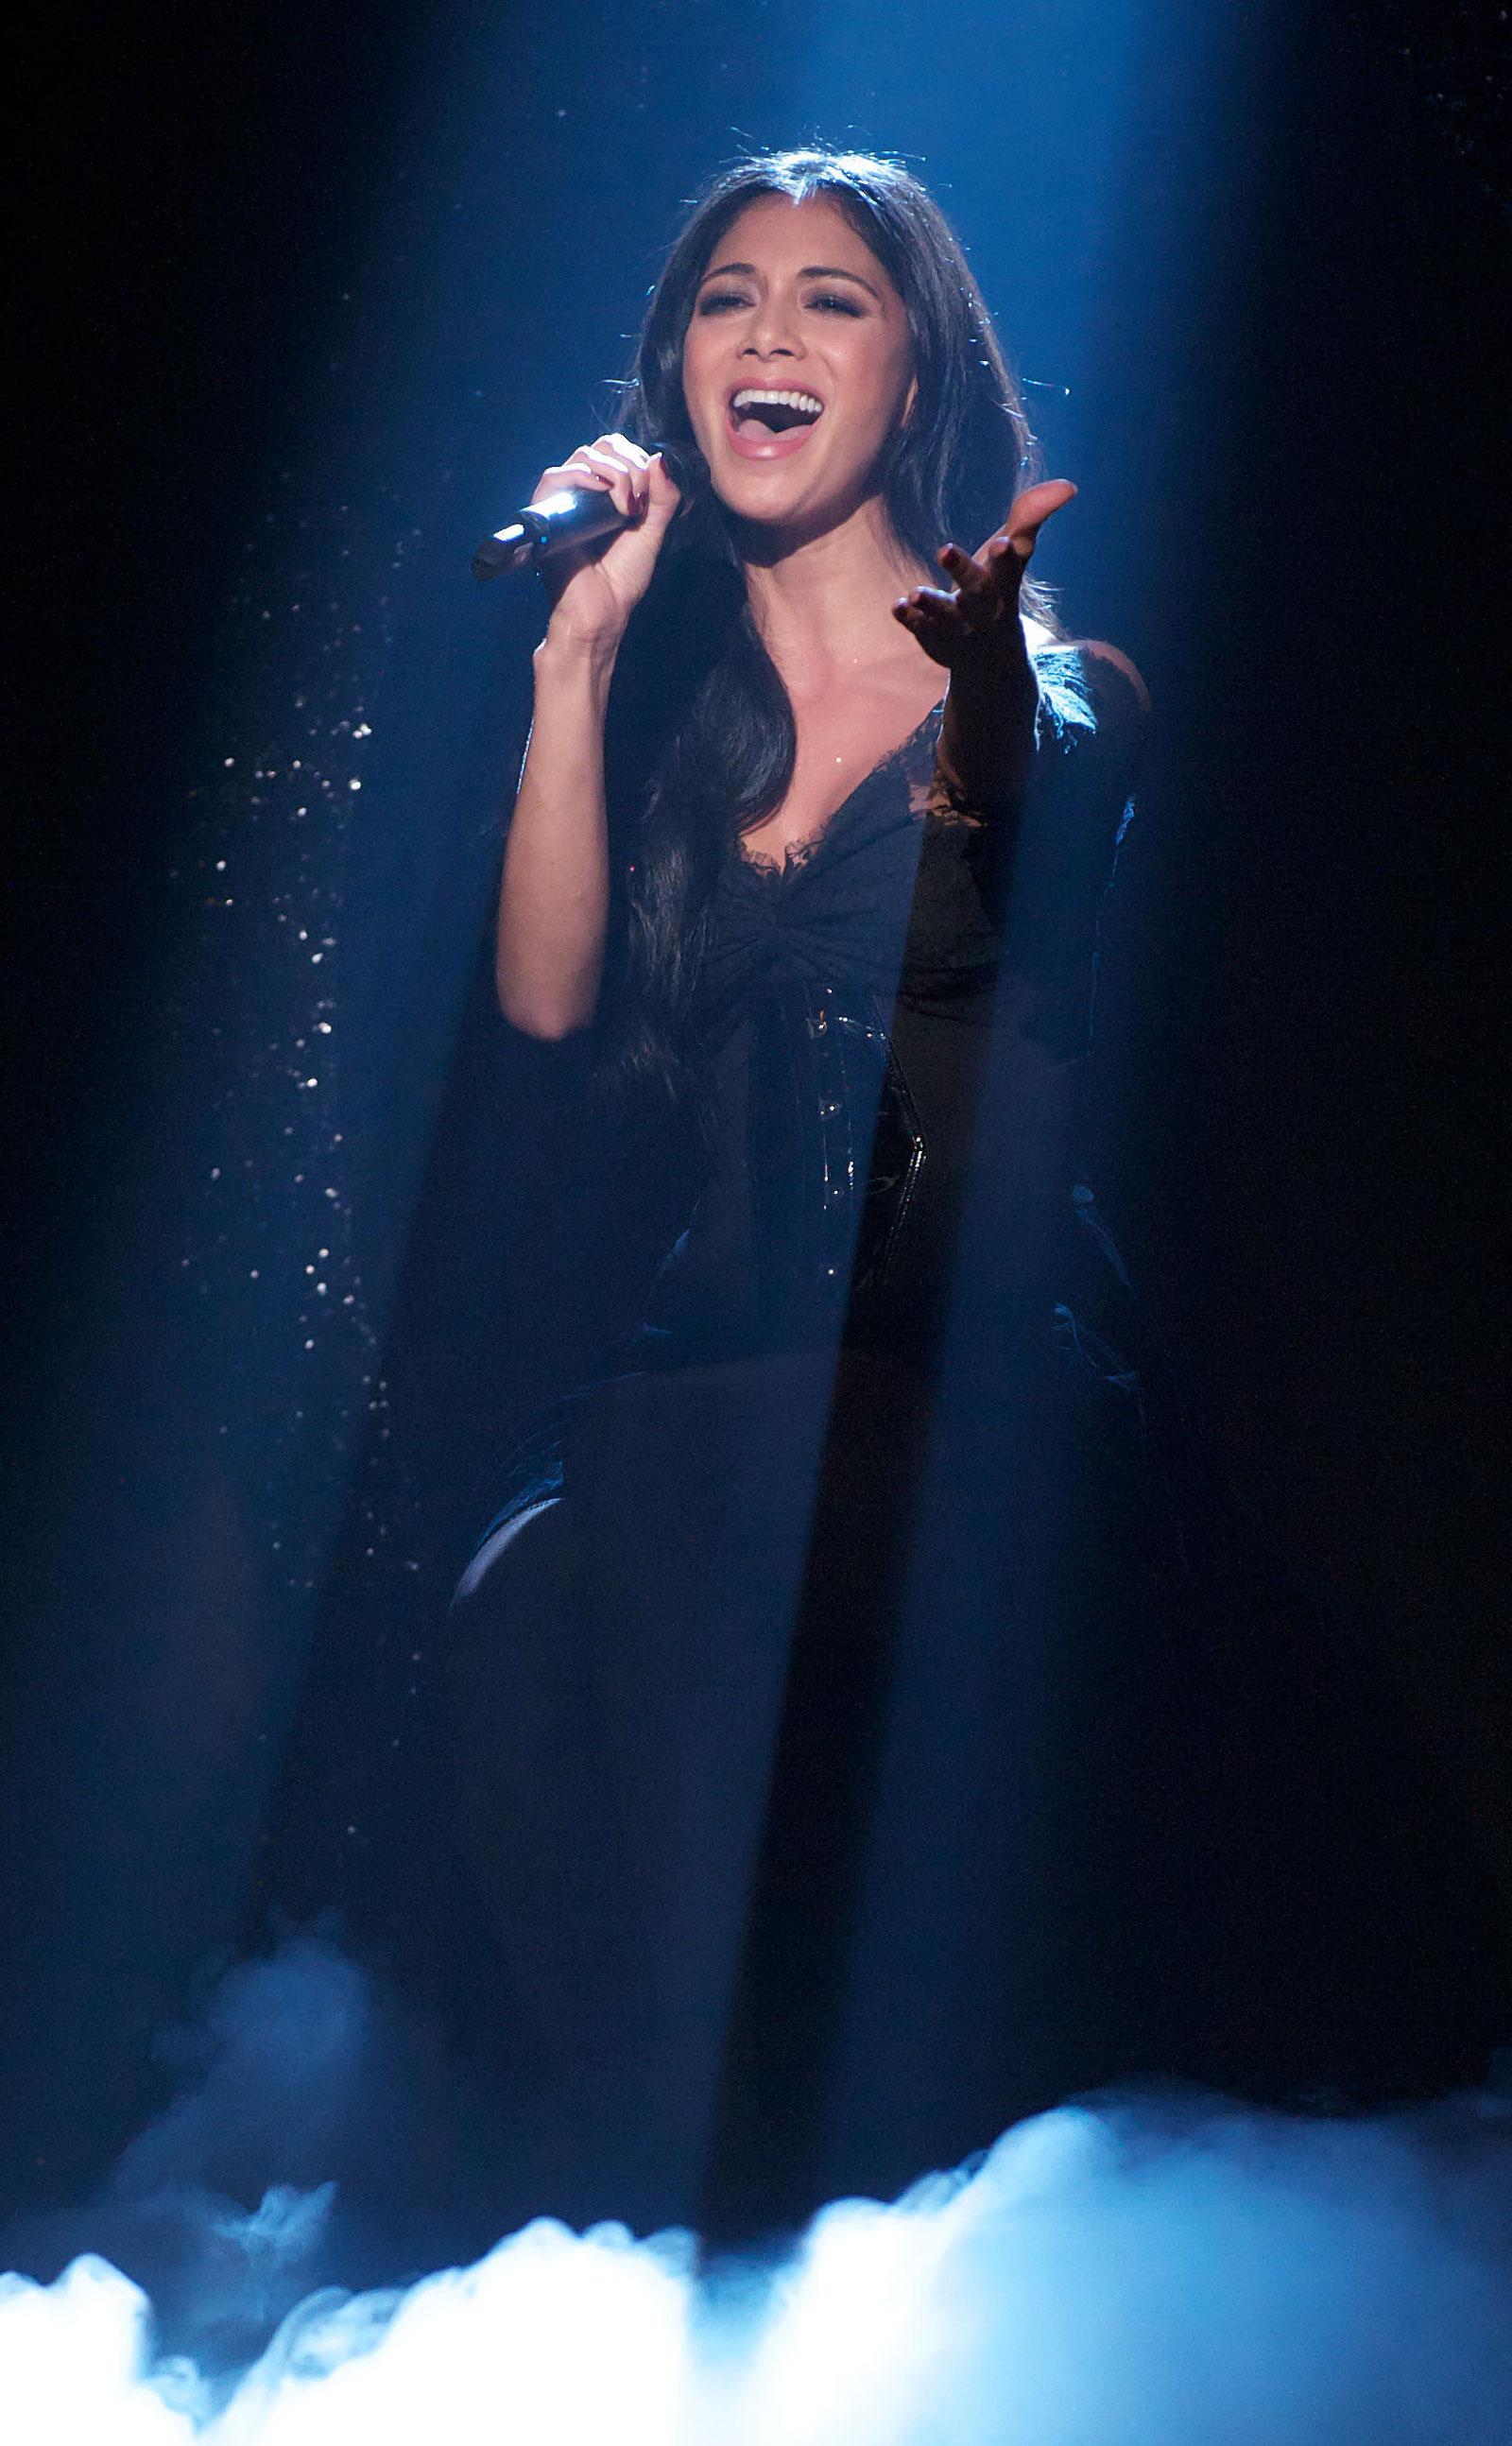 nicole scherzinger video musicali live bologna - photo#25